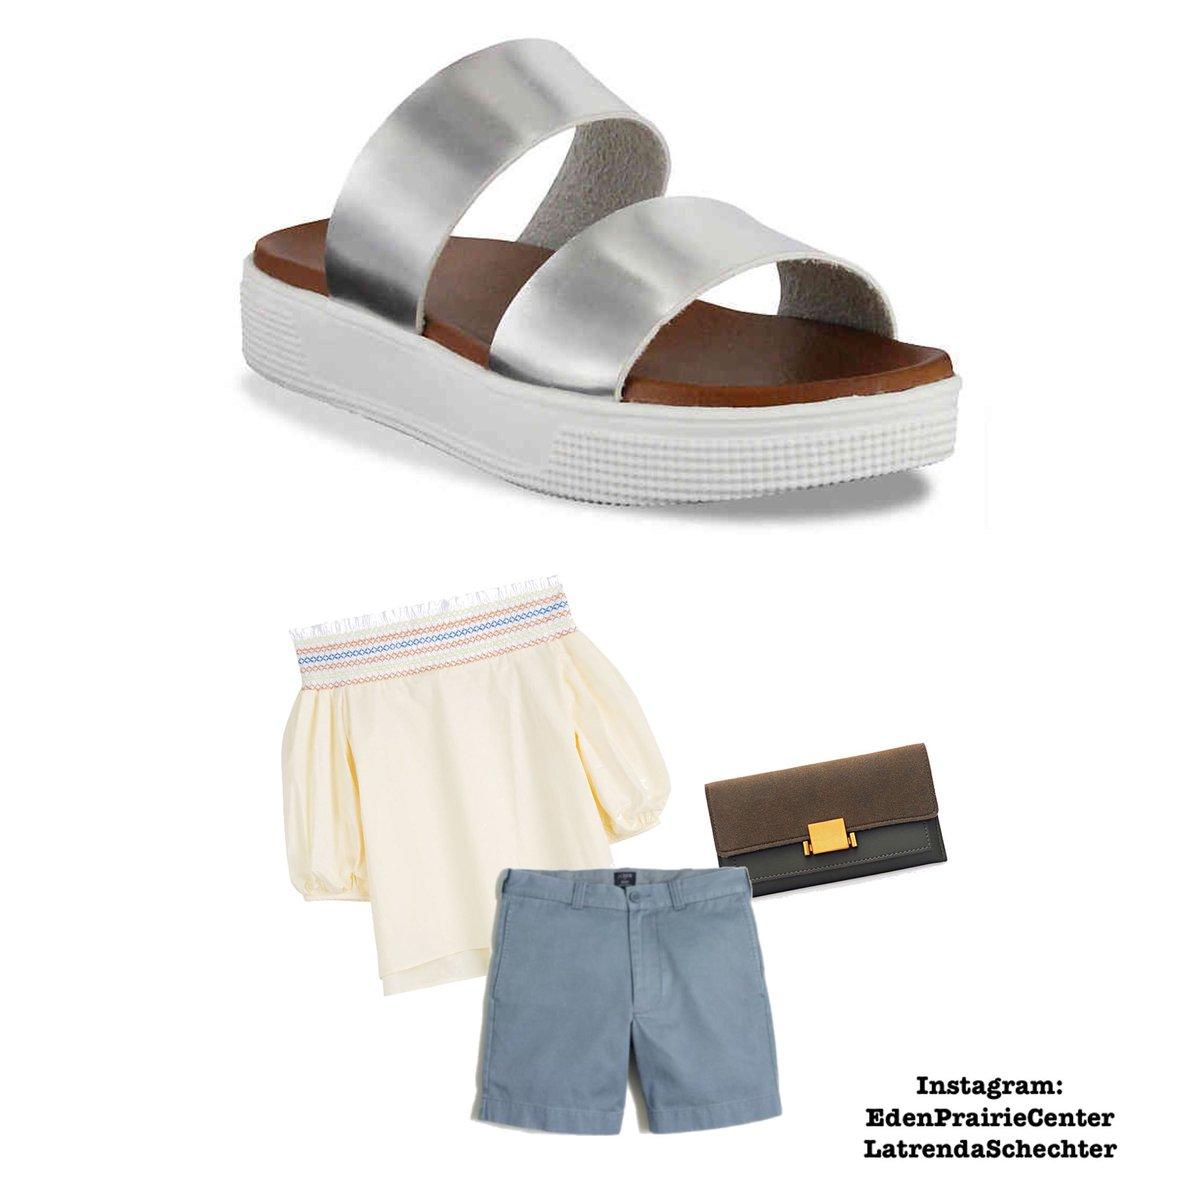 8a7ed3756c ... #shorts #summervacation #vacation #gorgeous #ootd #preppystyle  #momfashion #momblog #summer #edenprairie #flatsandals #makeuppic.twitter .com/Qoa9rcdC0x